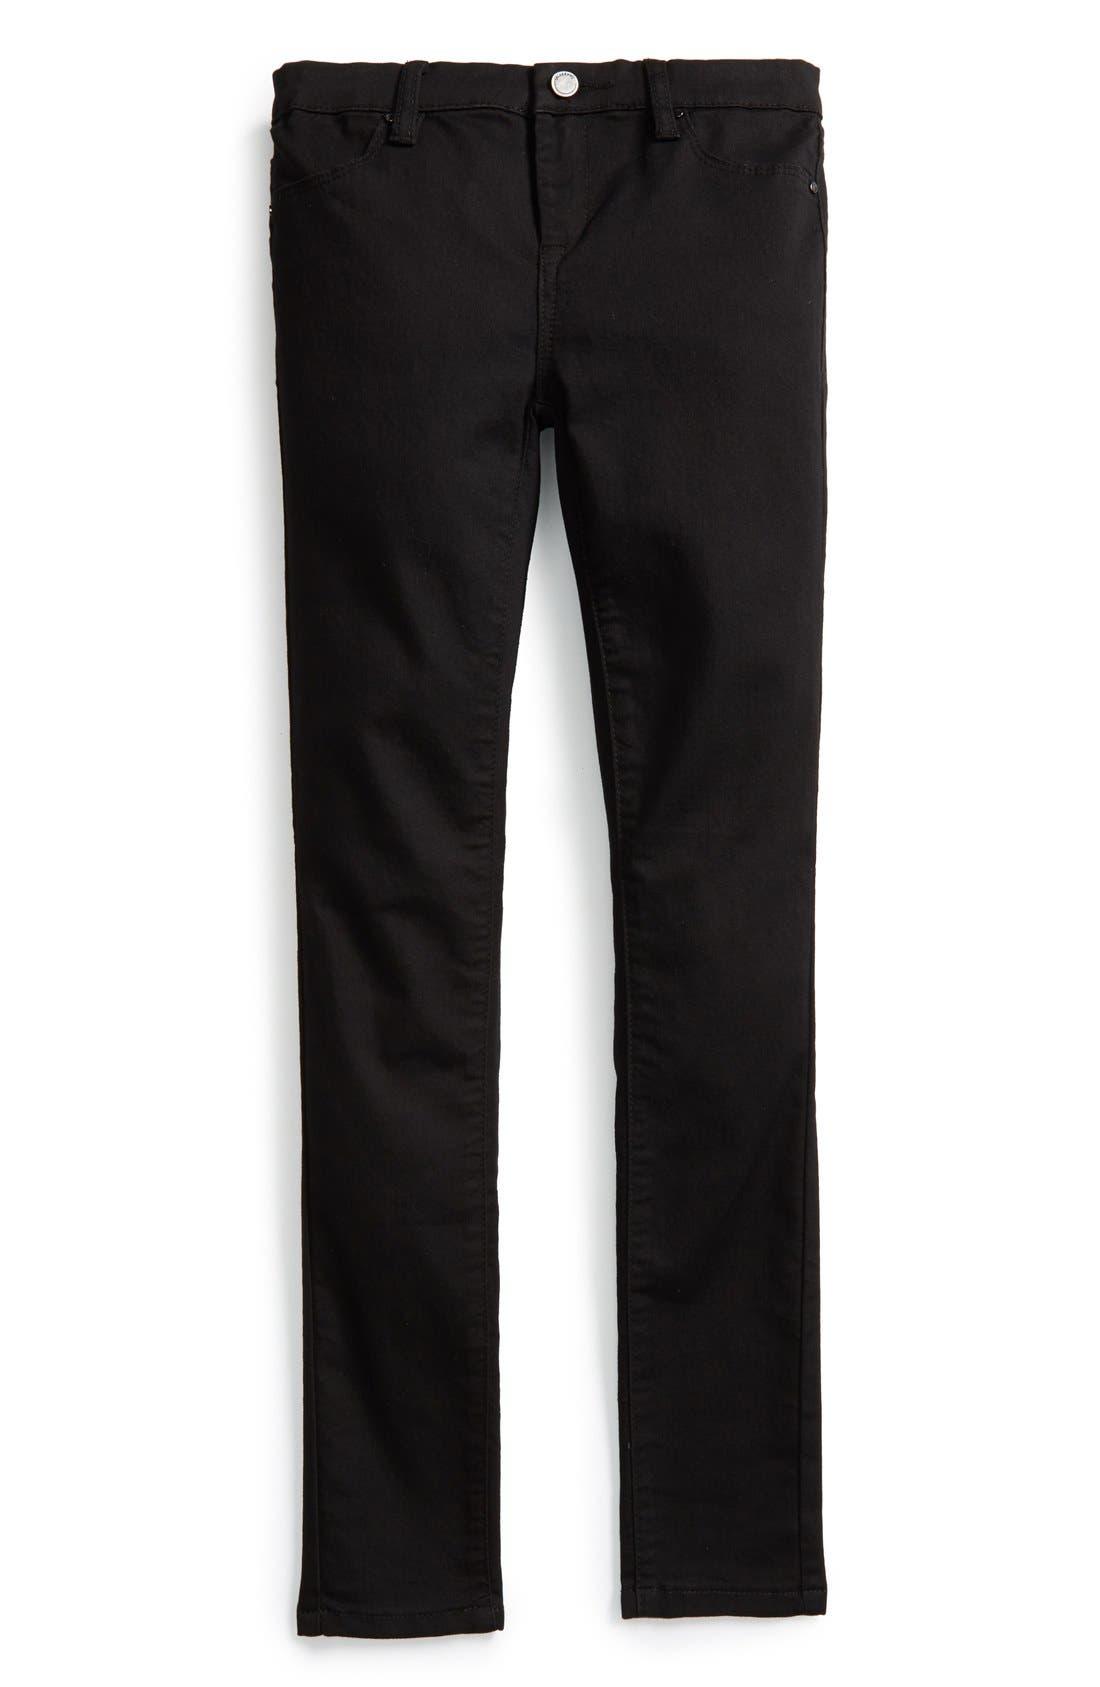 BLANKNYC Twill Skinny Jeans (Big Girls)